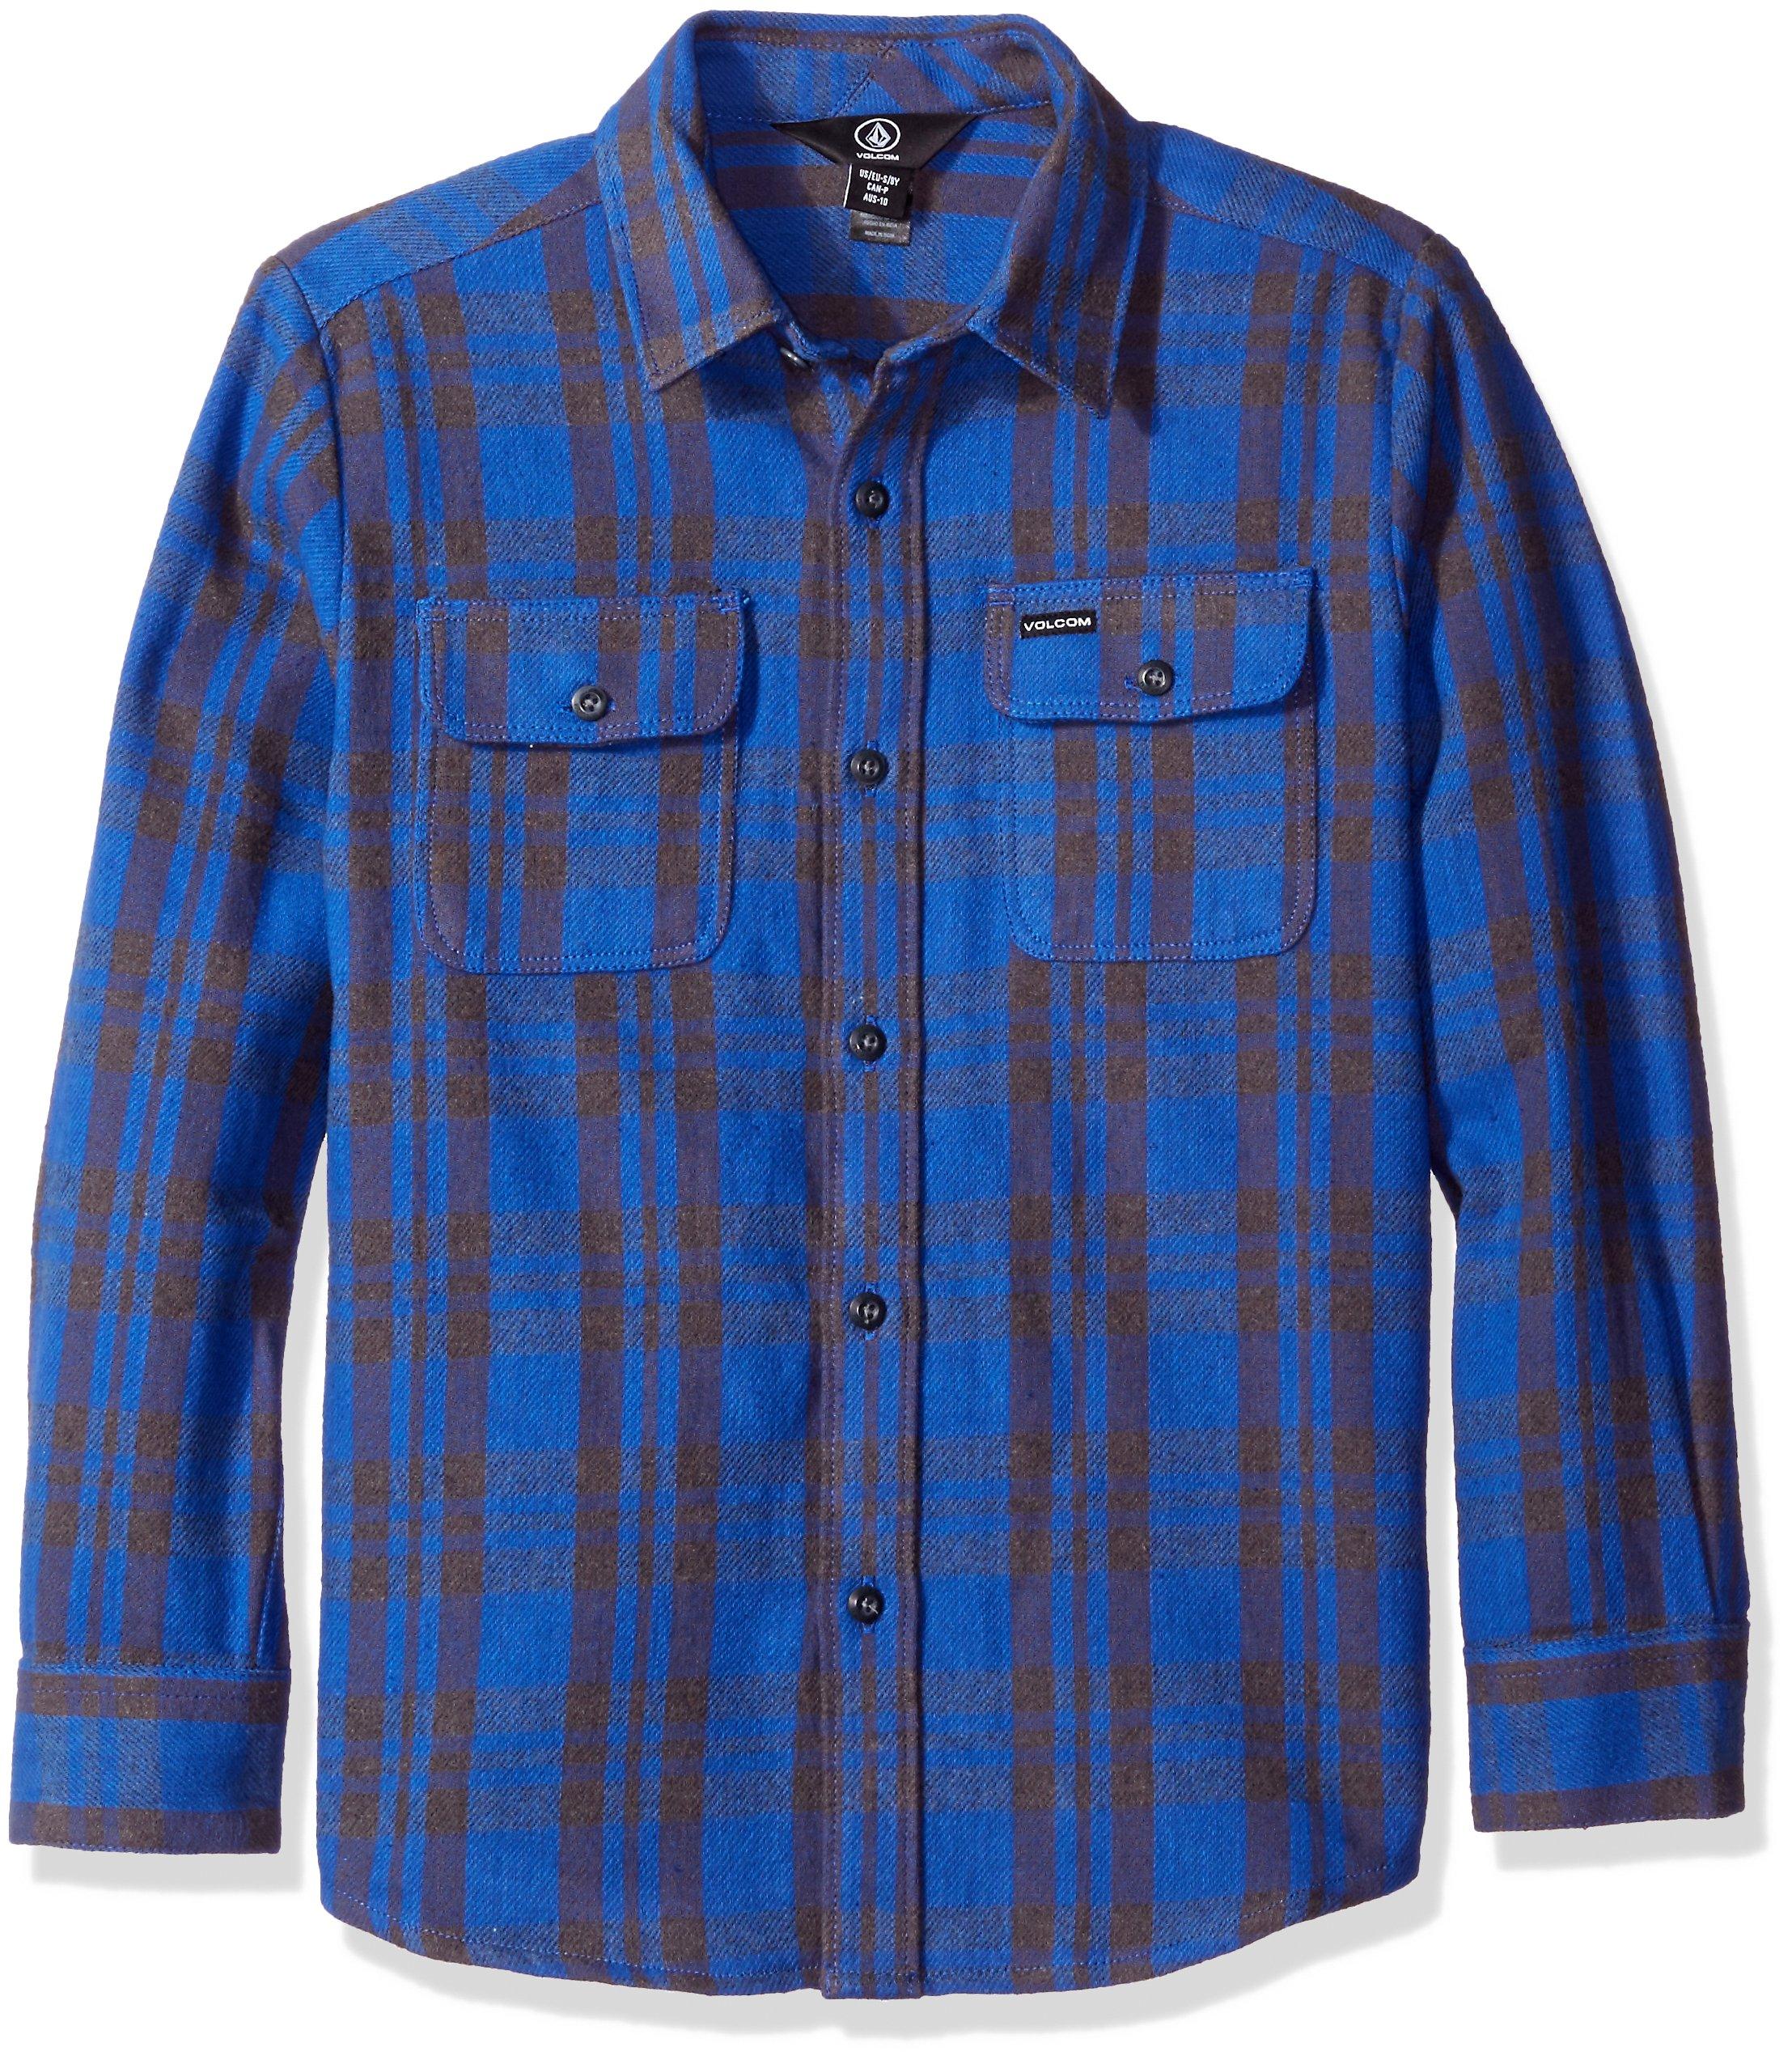 Volcom Big Boys' Copeland Long Sleeve Shirt, Smokey Blue, Large